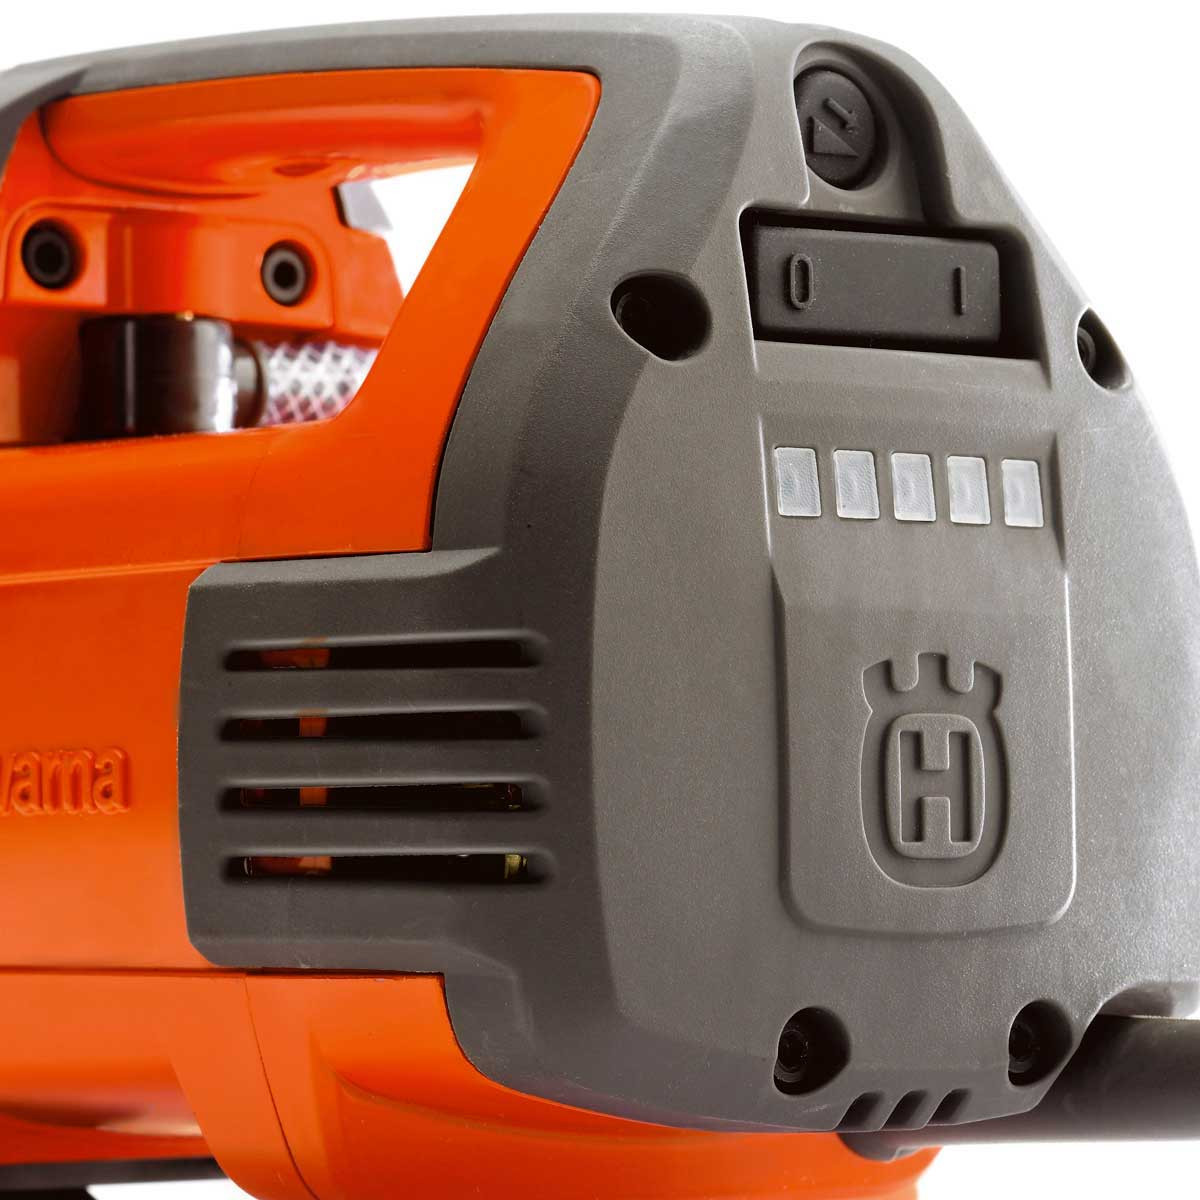 Husqvarna DMS 280 gear box selector